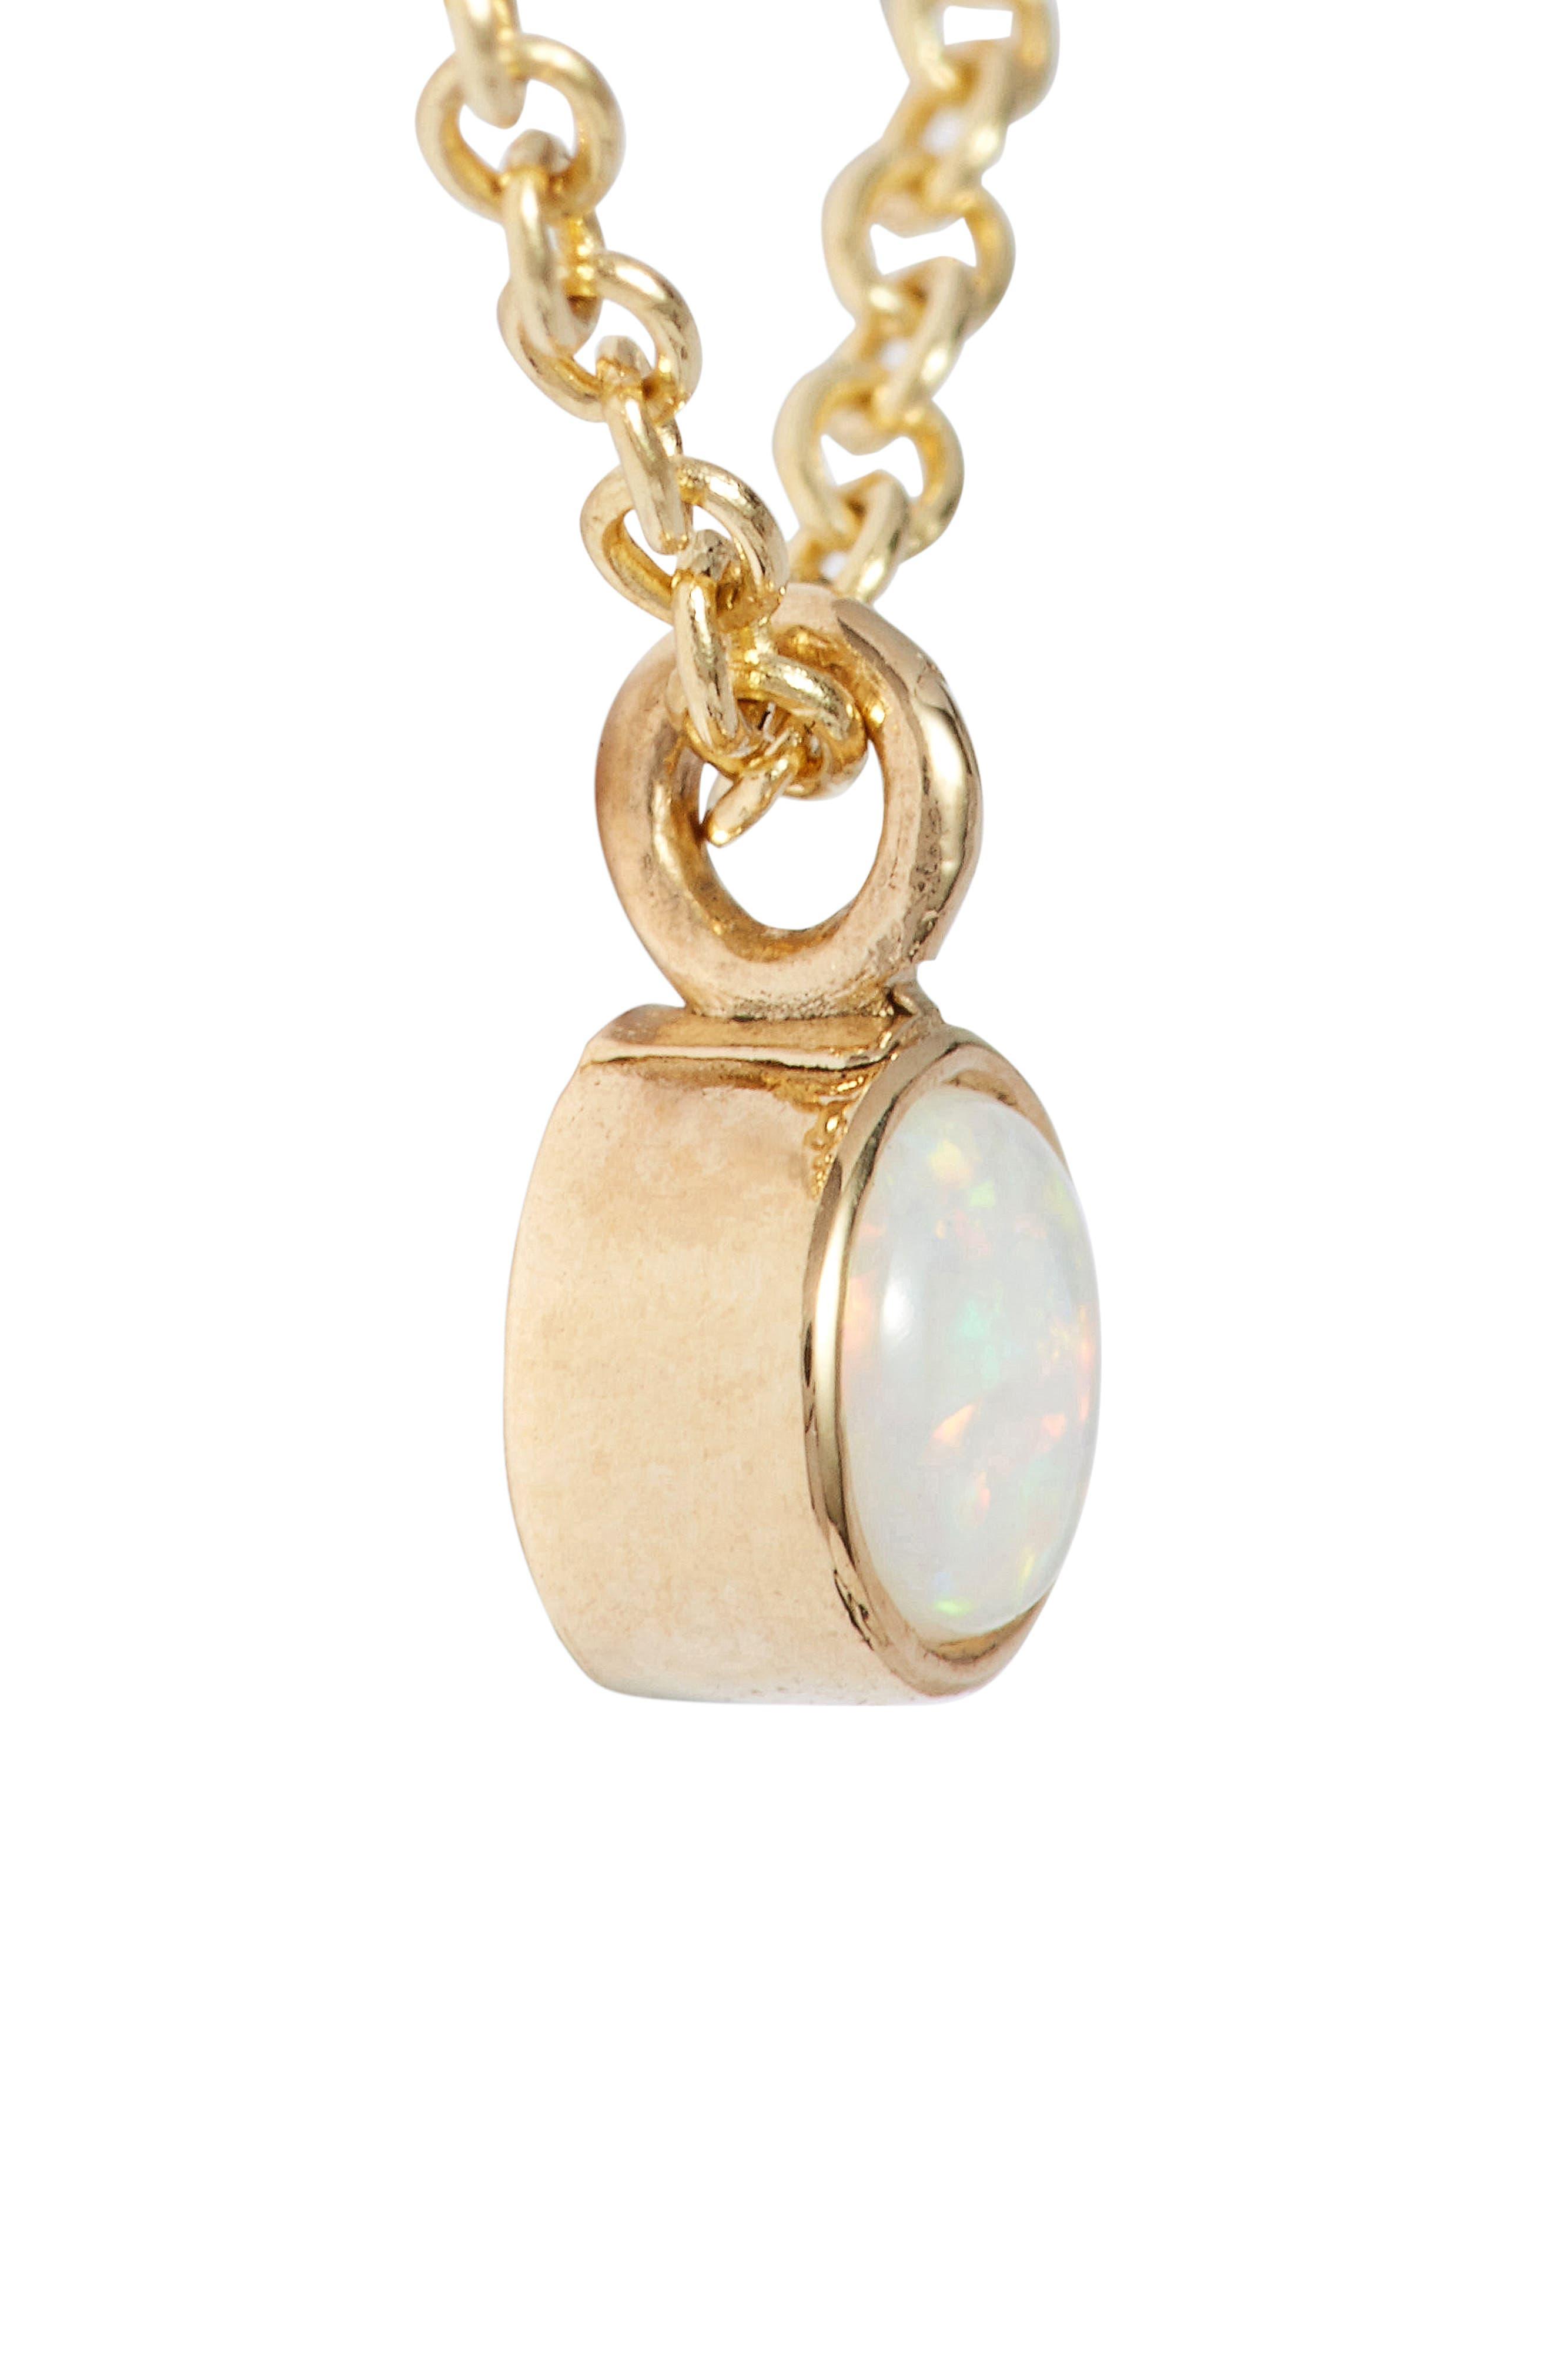 Dangling Semiprecious Stone Choker,                             Alternate thumbnail 4, color,                             YELLOW GOLD/ OPAL